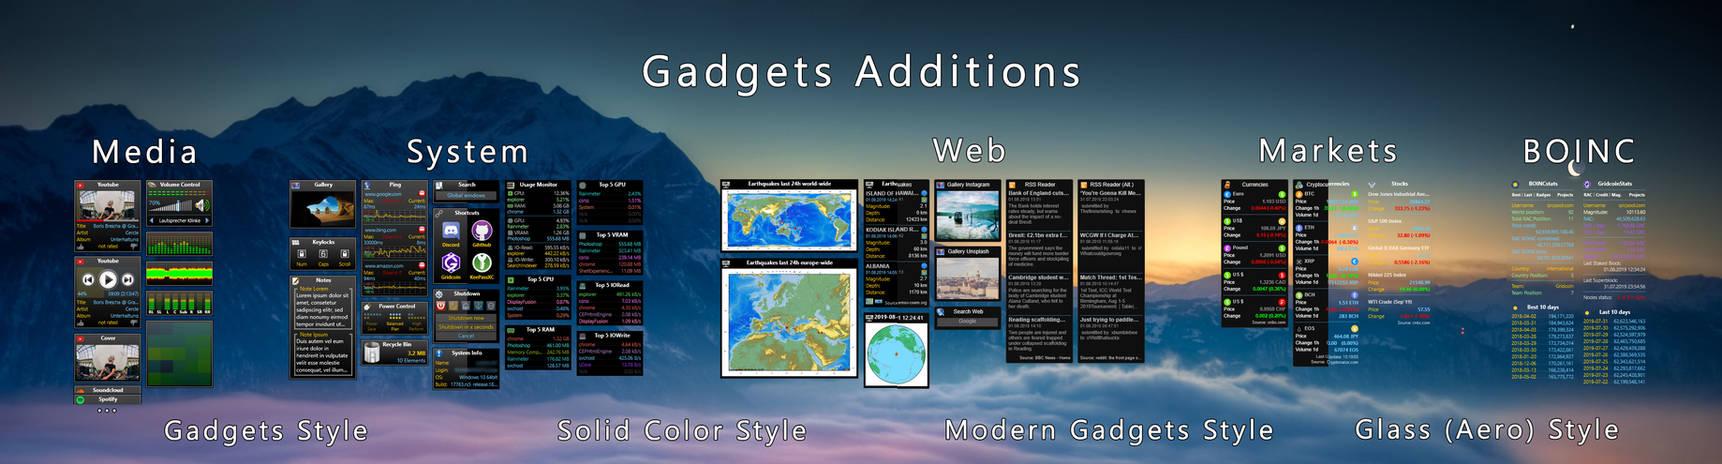 Gadgets Additions 4.3.1